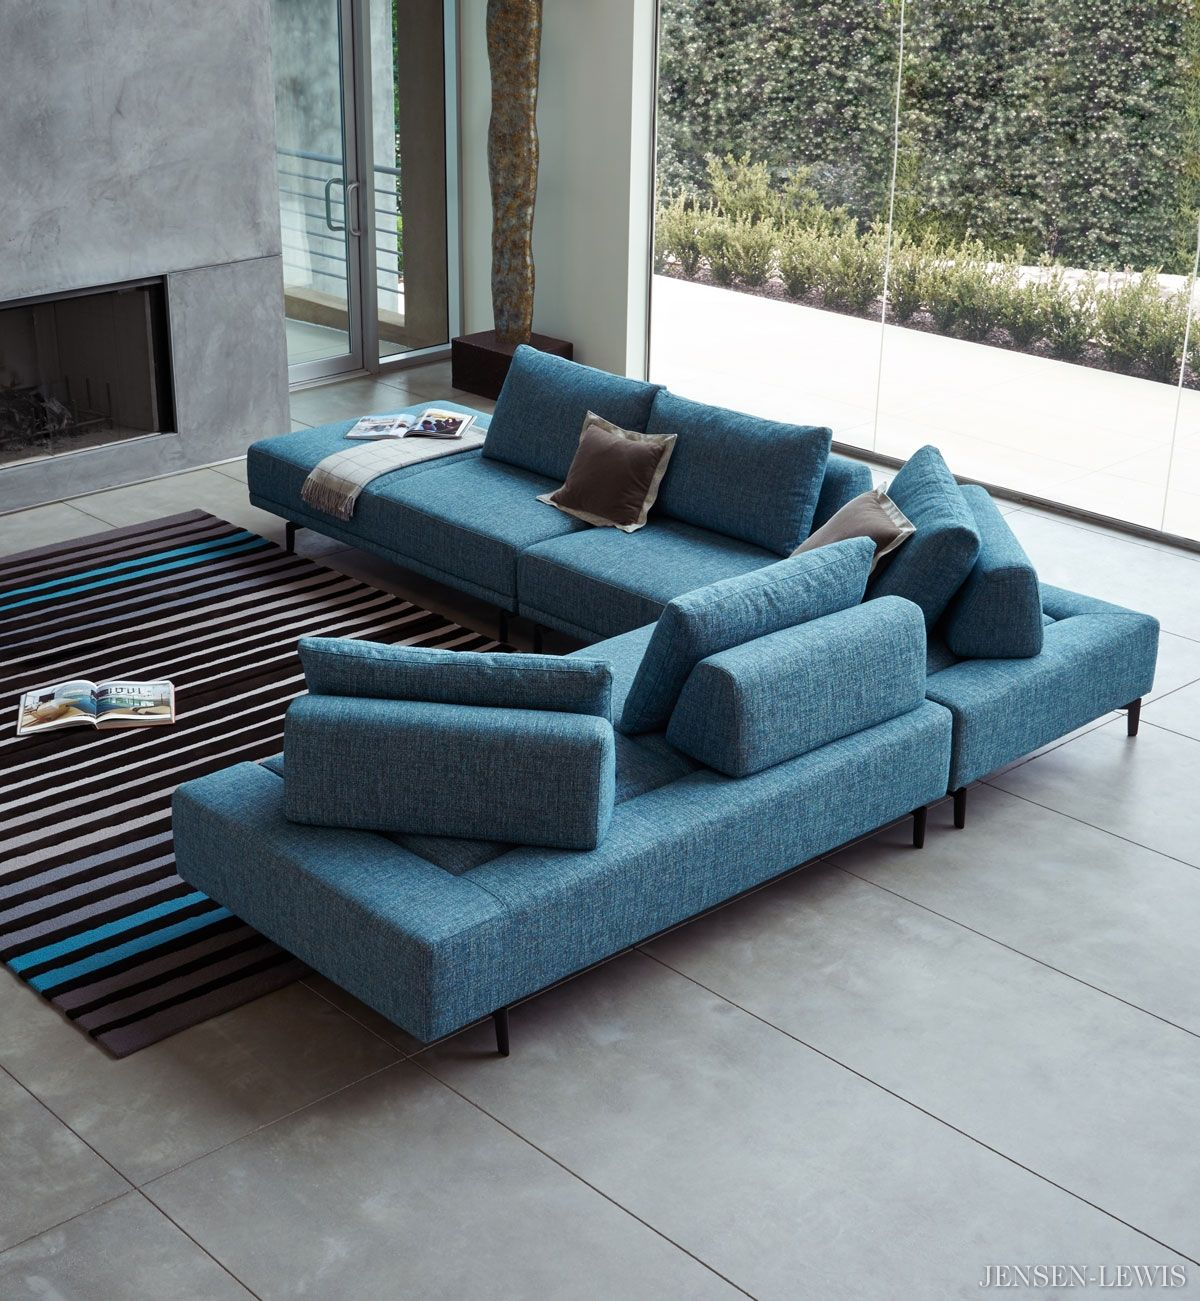 Felix Modular Sectional Sofa Modular Sectional Sofa Modern Furniture Living Room Luxury Furniture